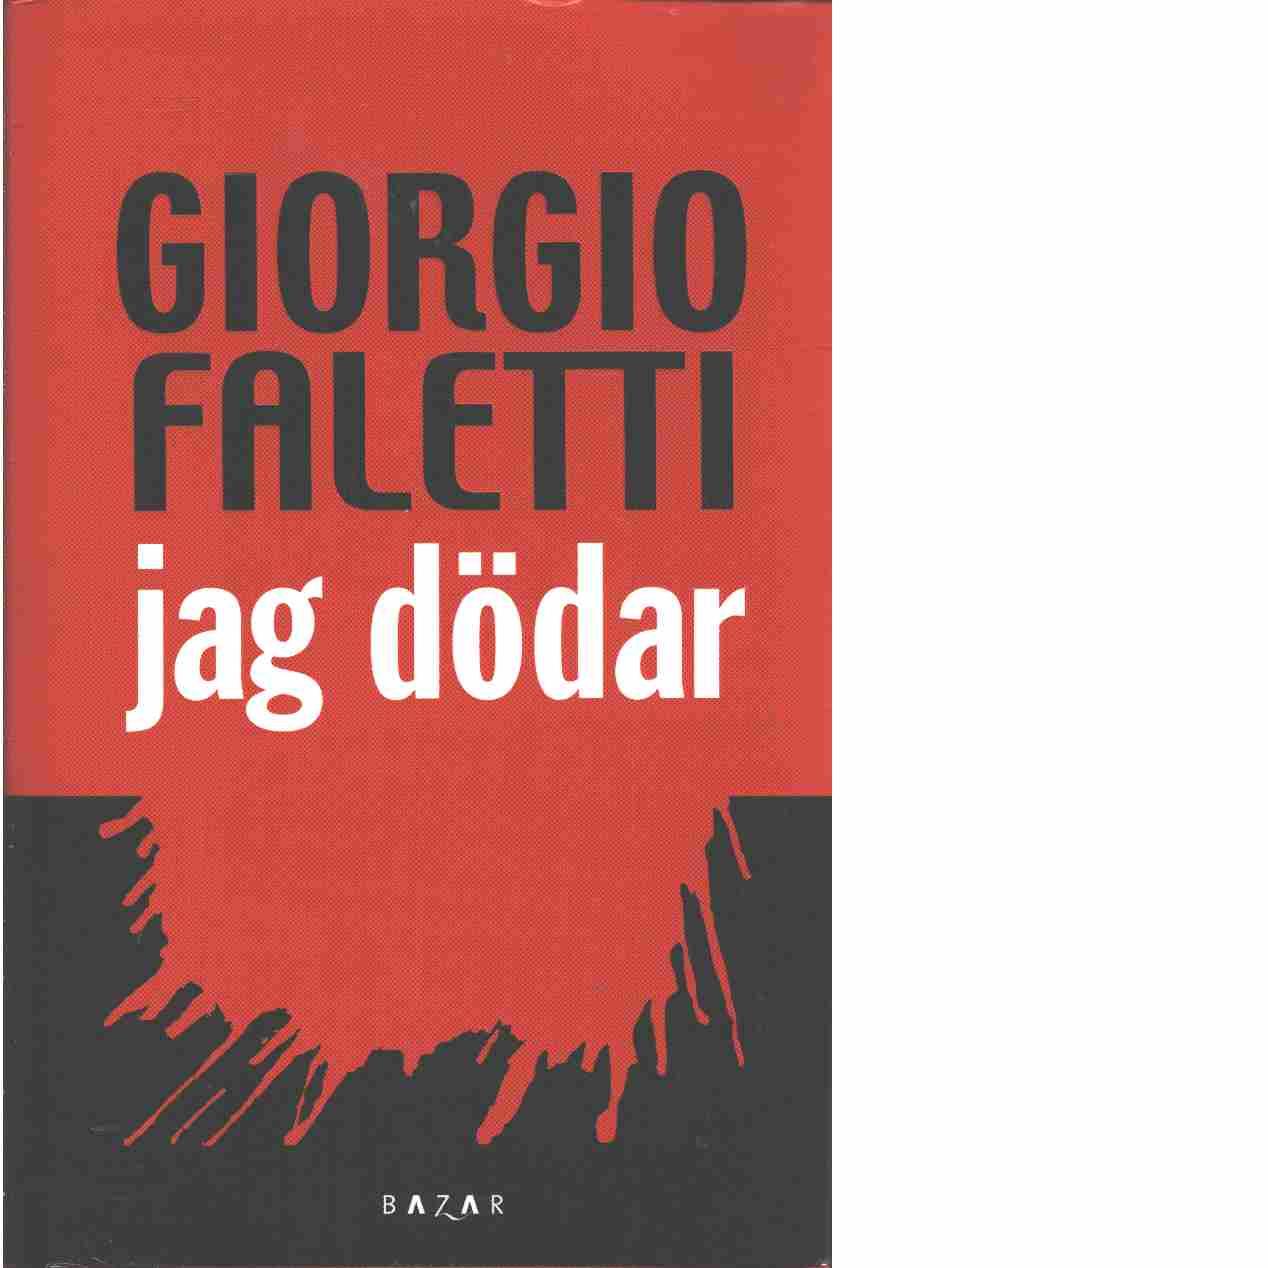 Jag dödar - Faletti, Giorgio